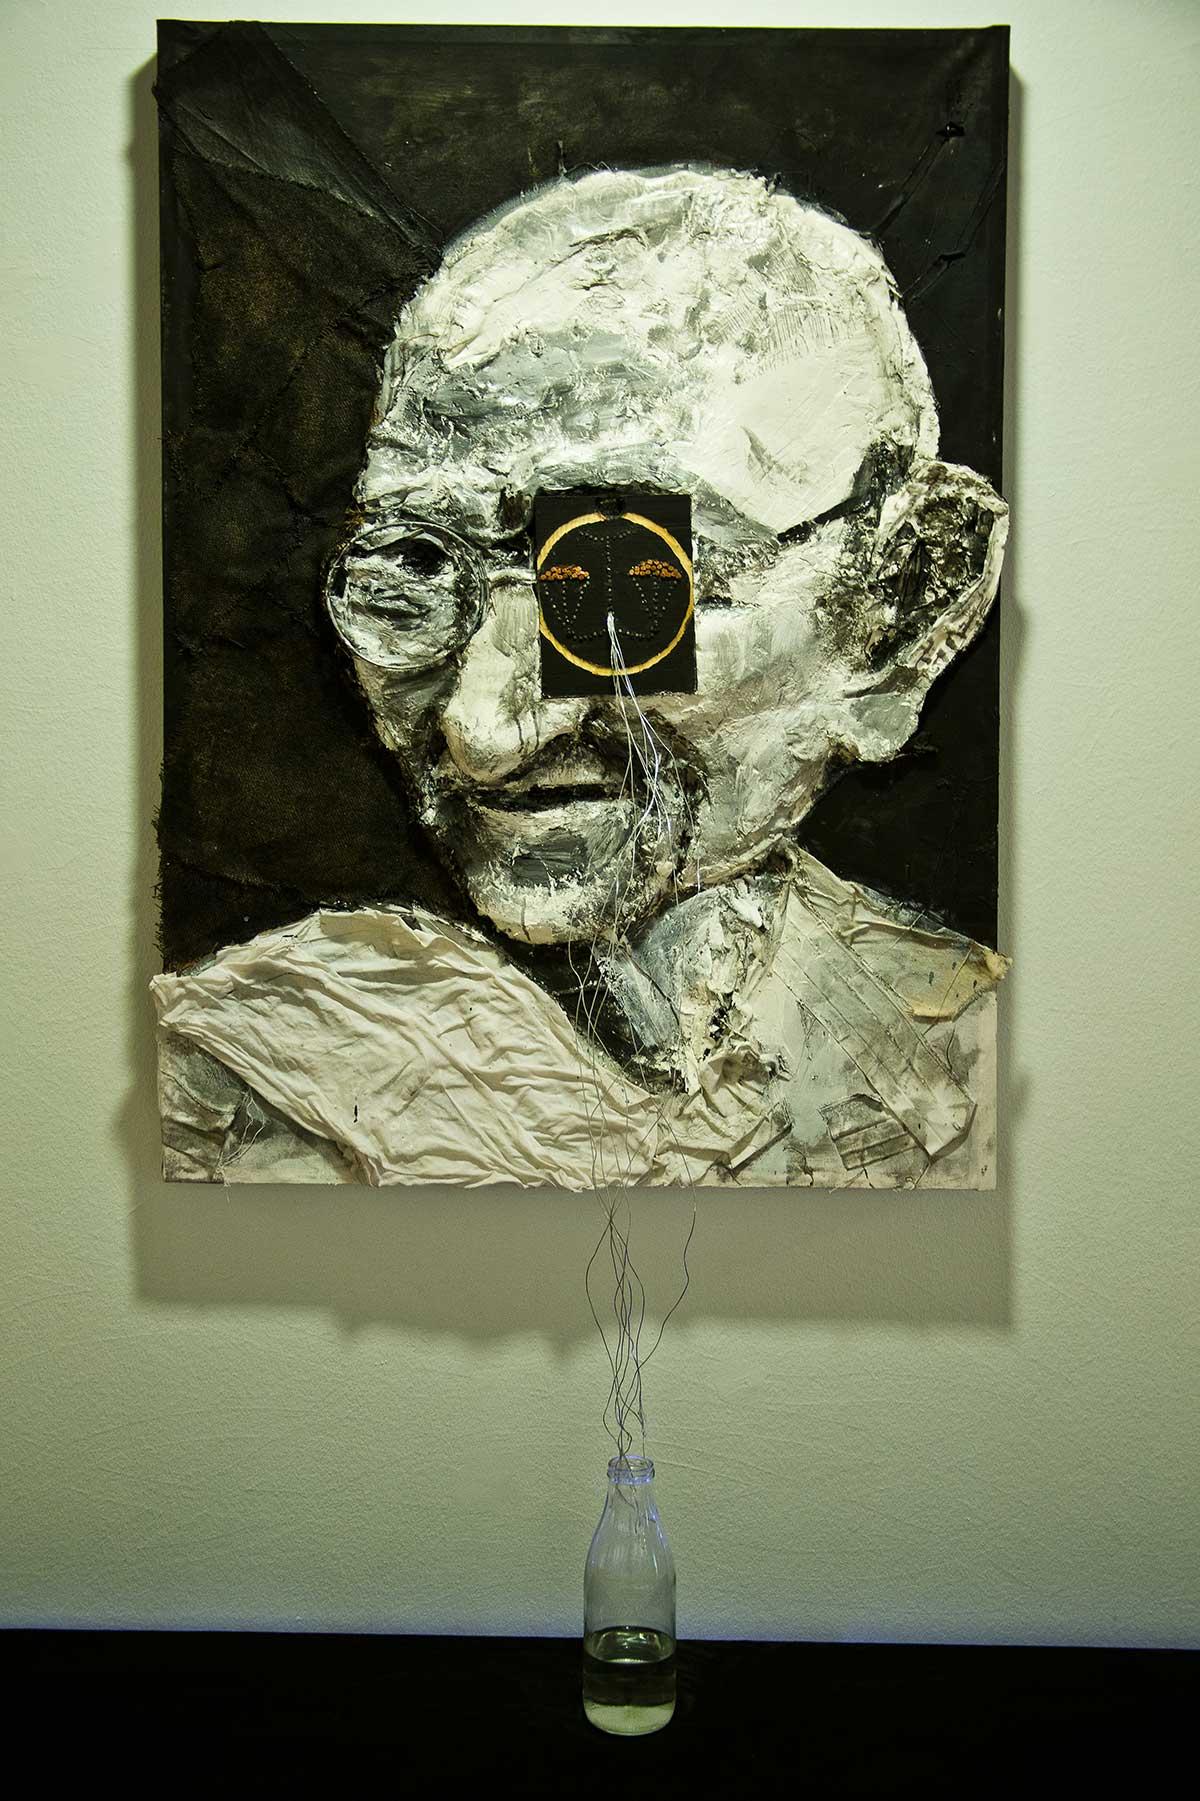 Ghandi-llora-por-injusticia. IndiaSensations